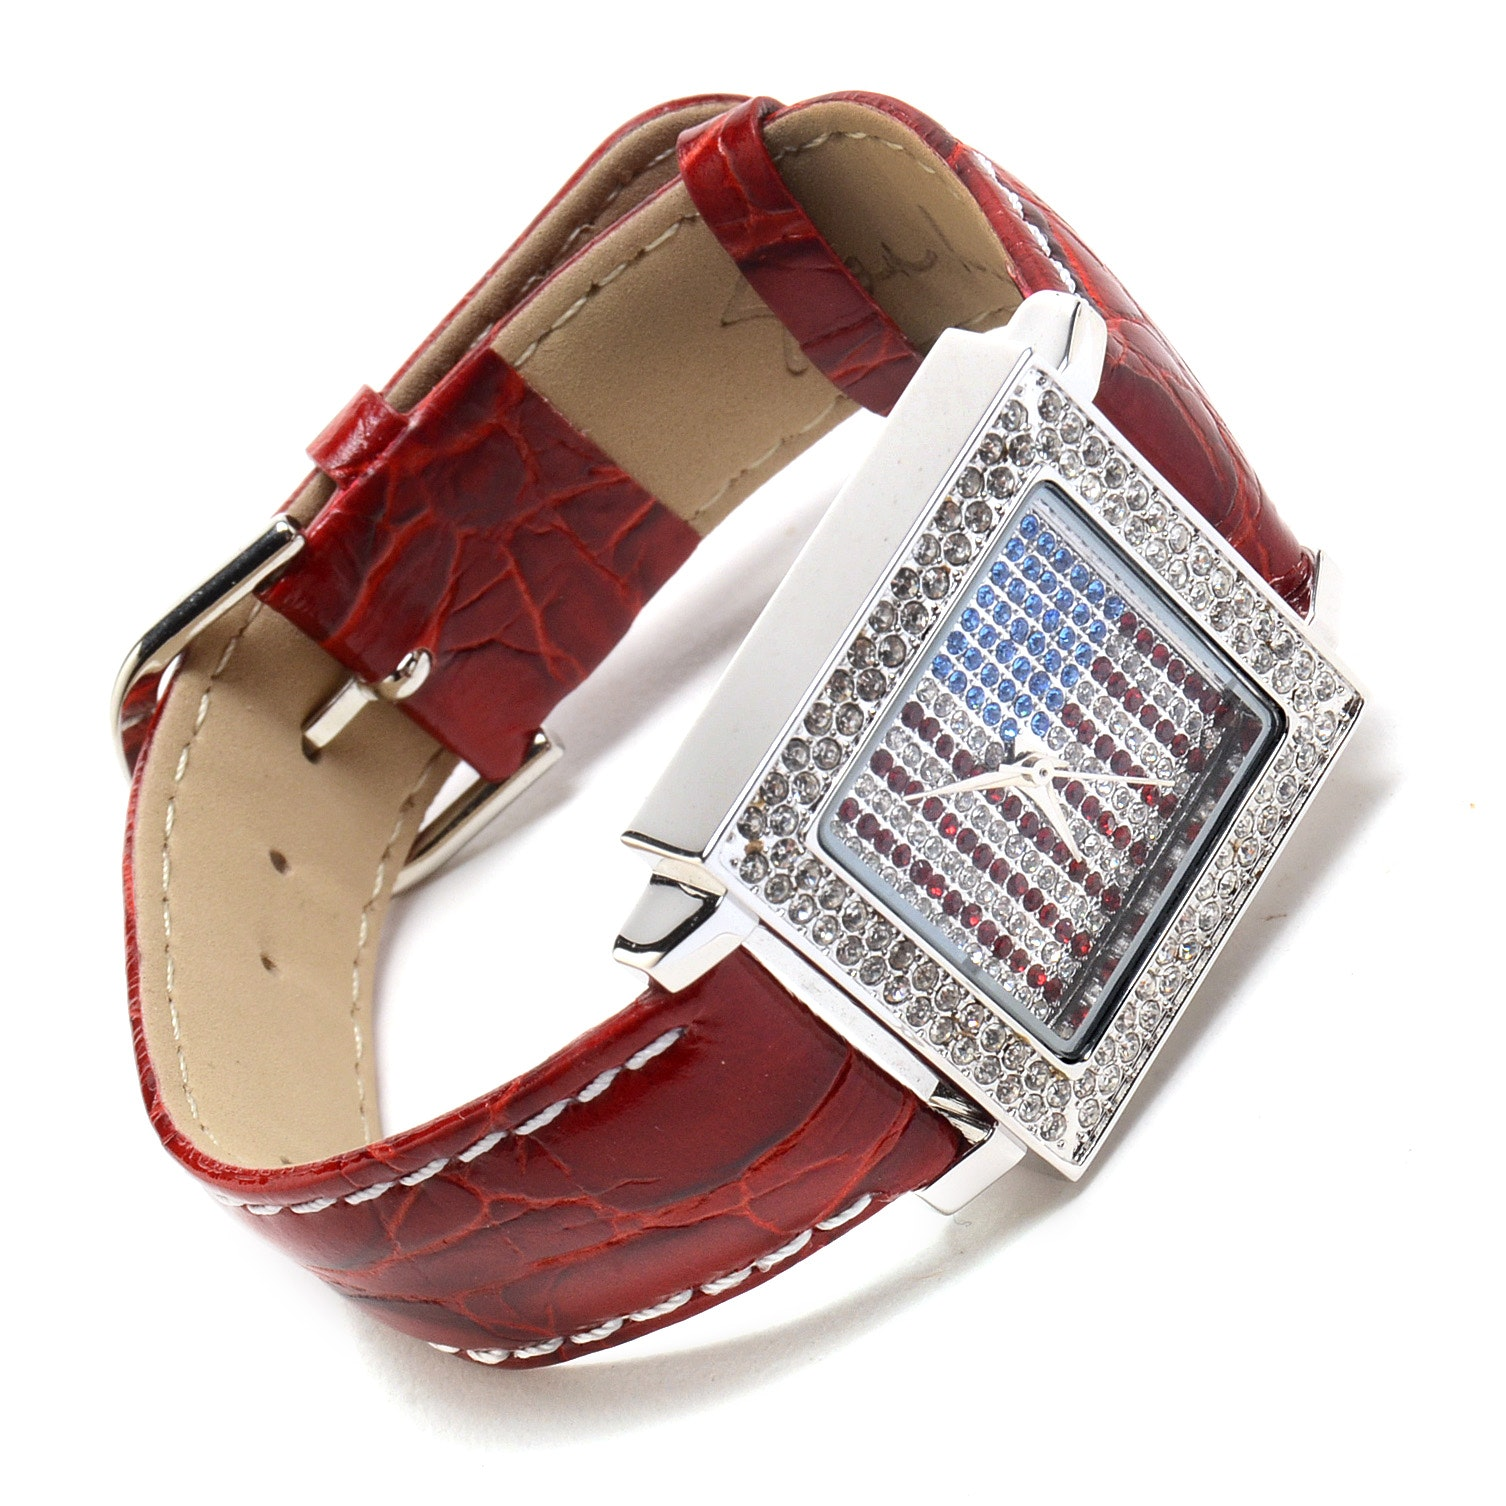 Susan Lucci Brand Wristwatch Encrusted With Rhinestones